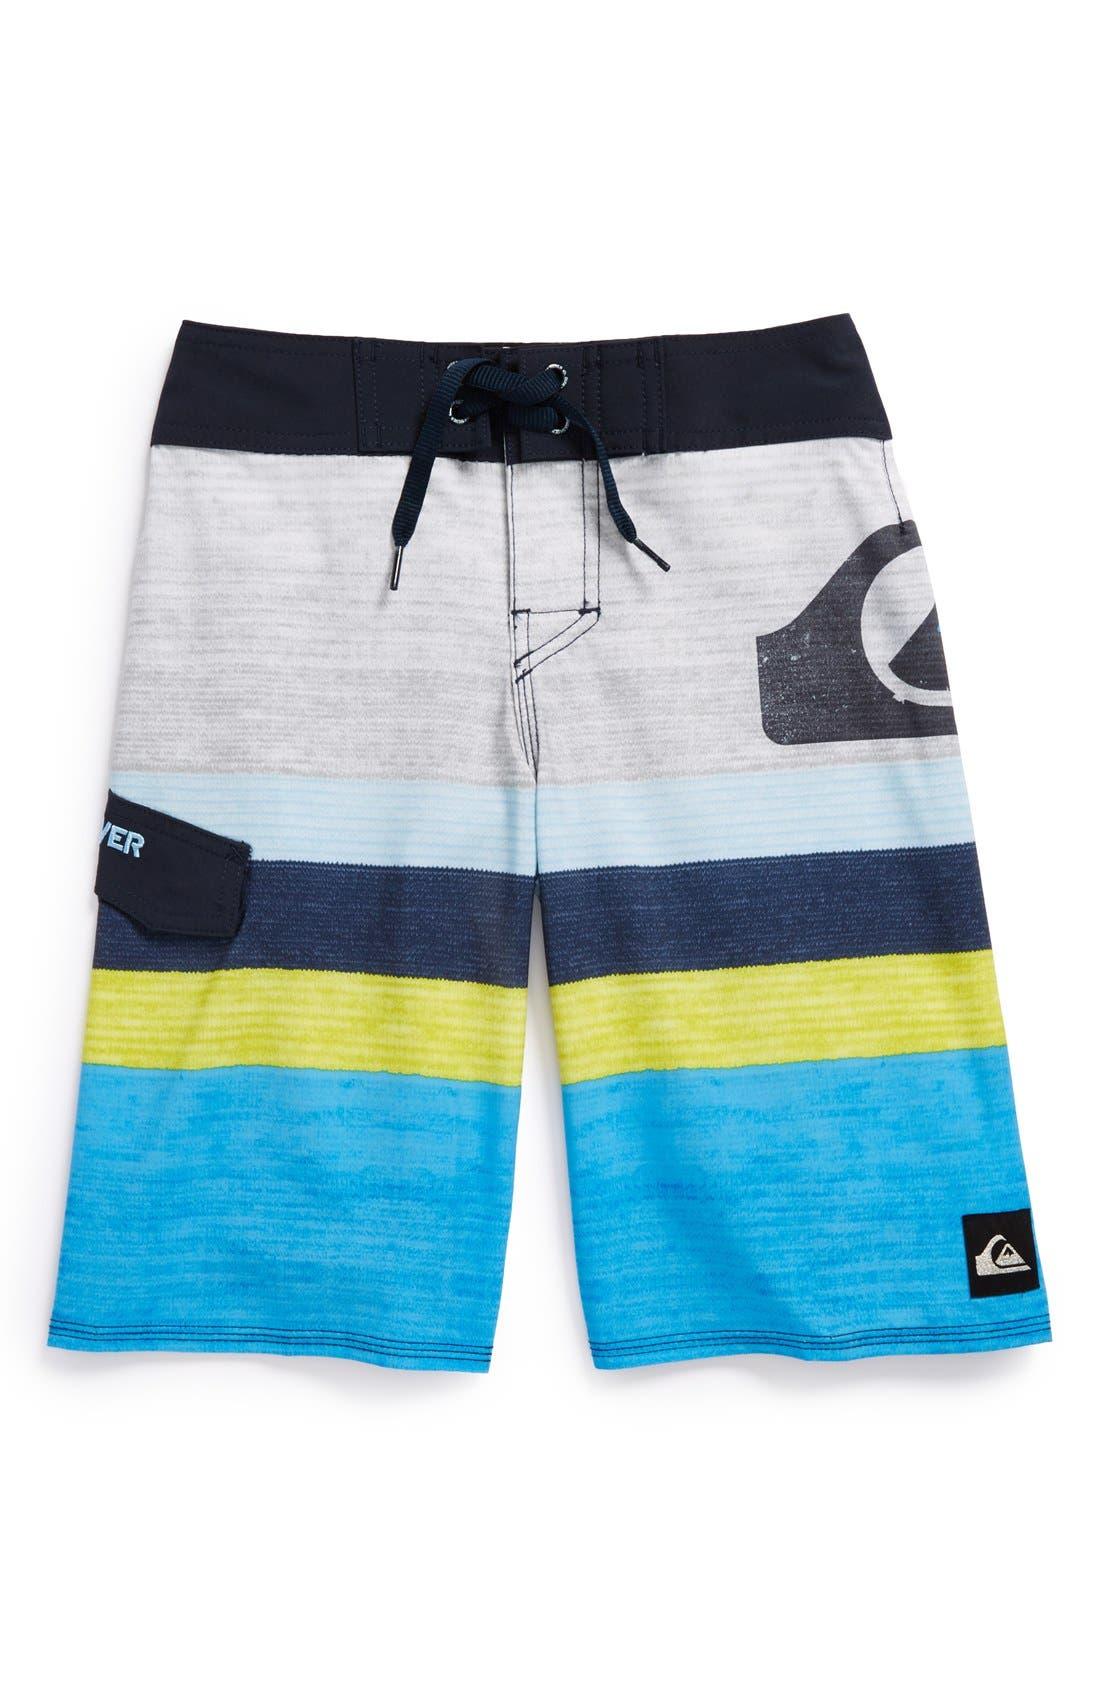 Alternate Image 1 Selected - Quiksilver 'Slater' Board Shorts (Little Boys & Big Boys)